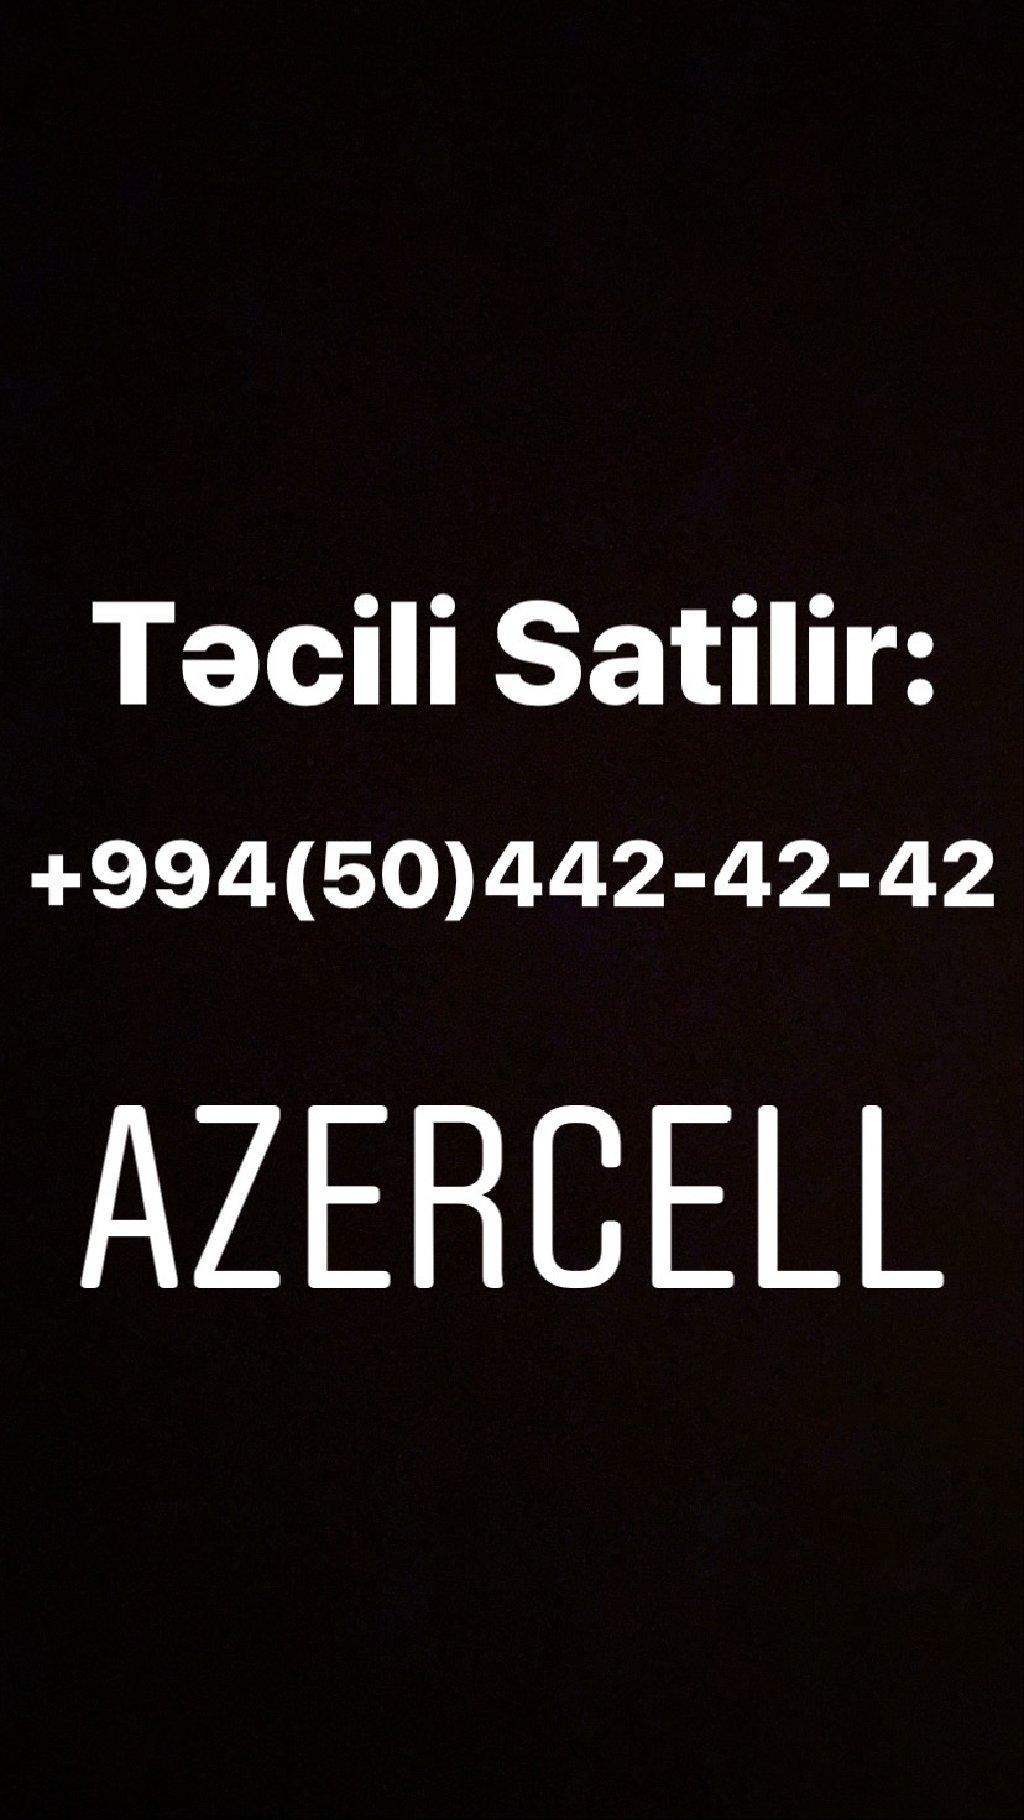 Azercell nomre Tecili satilir